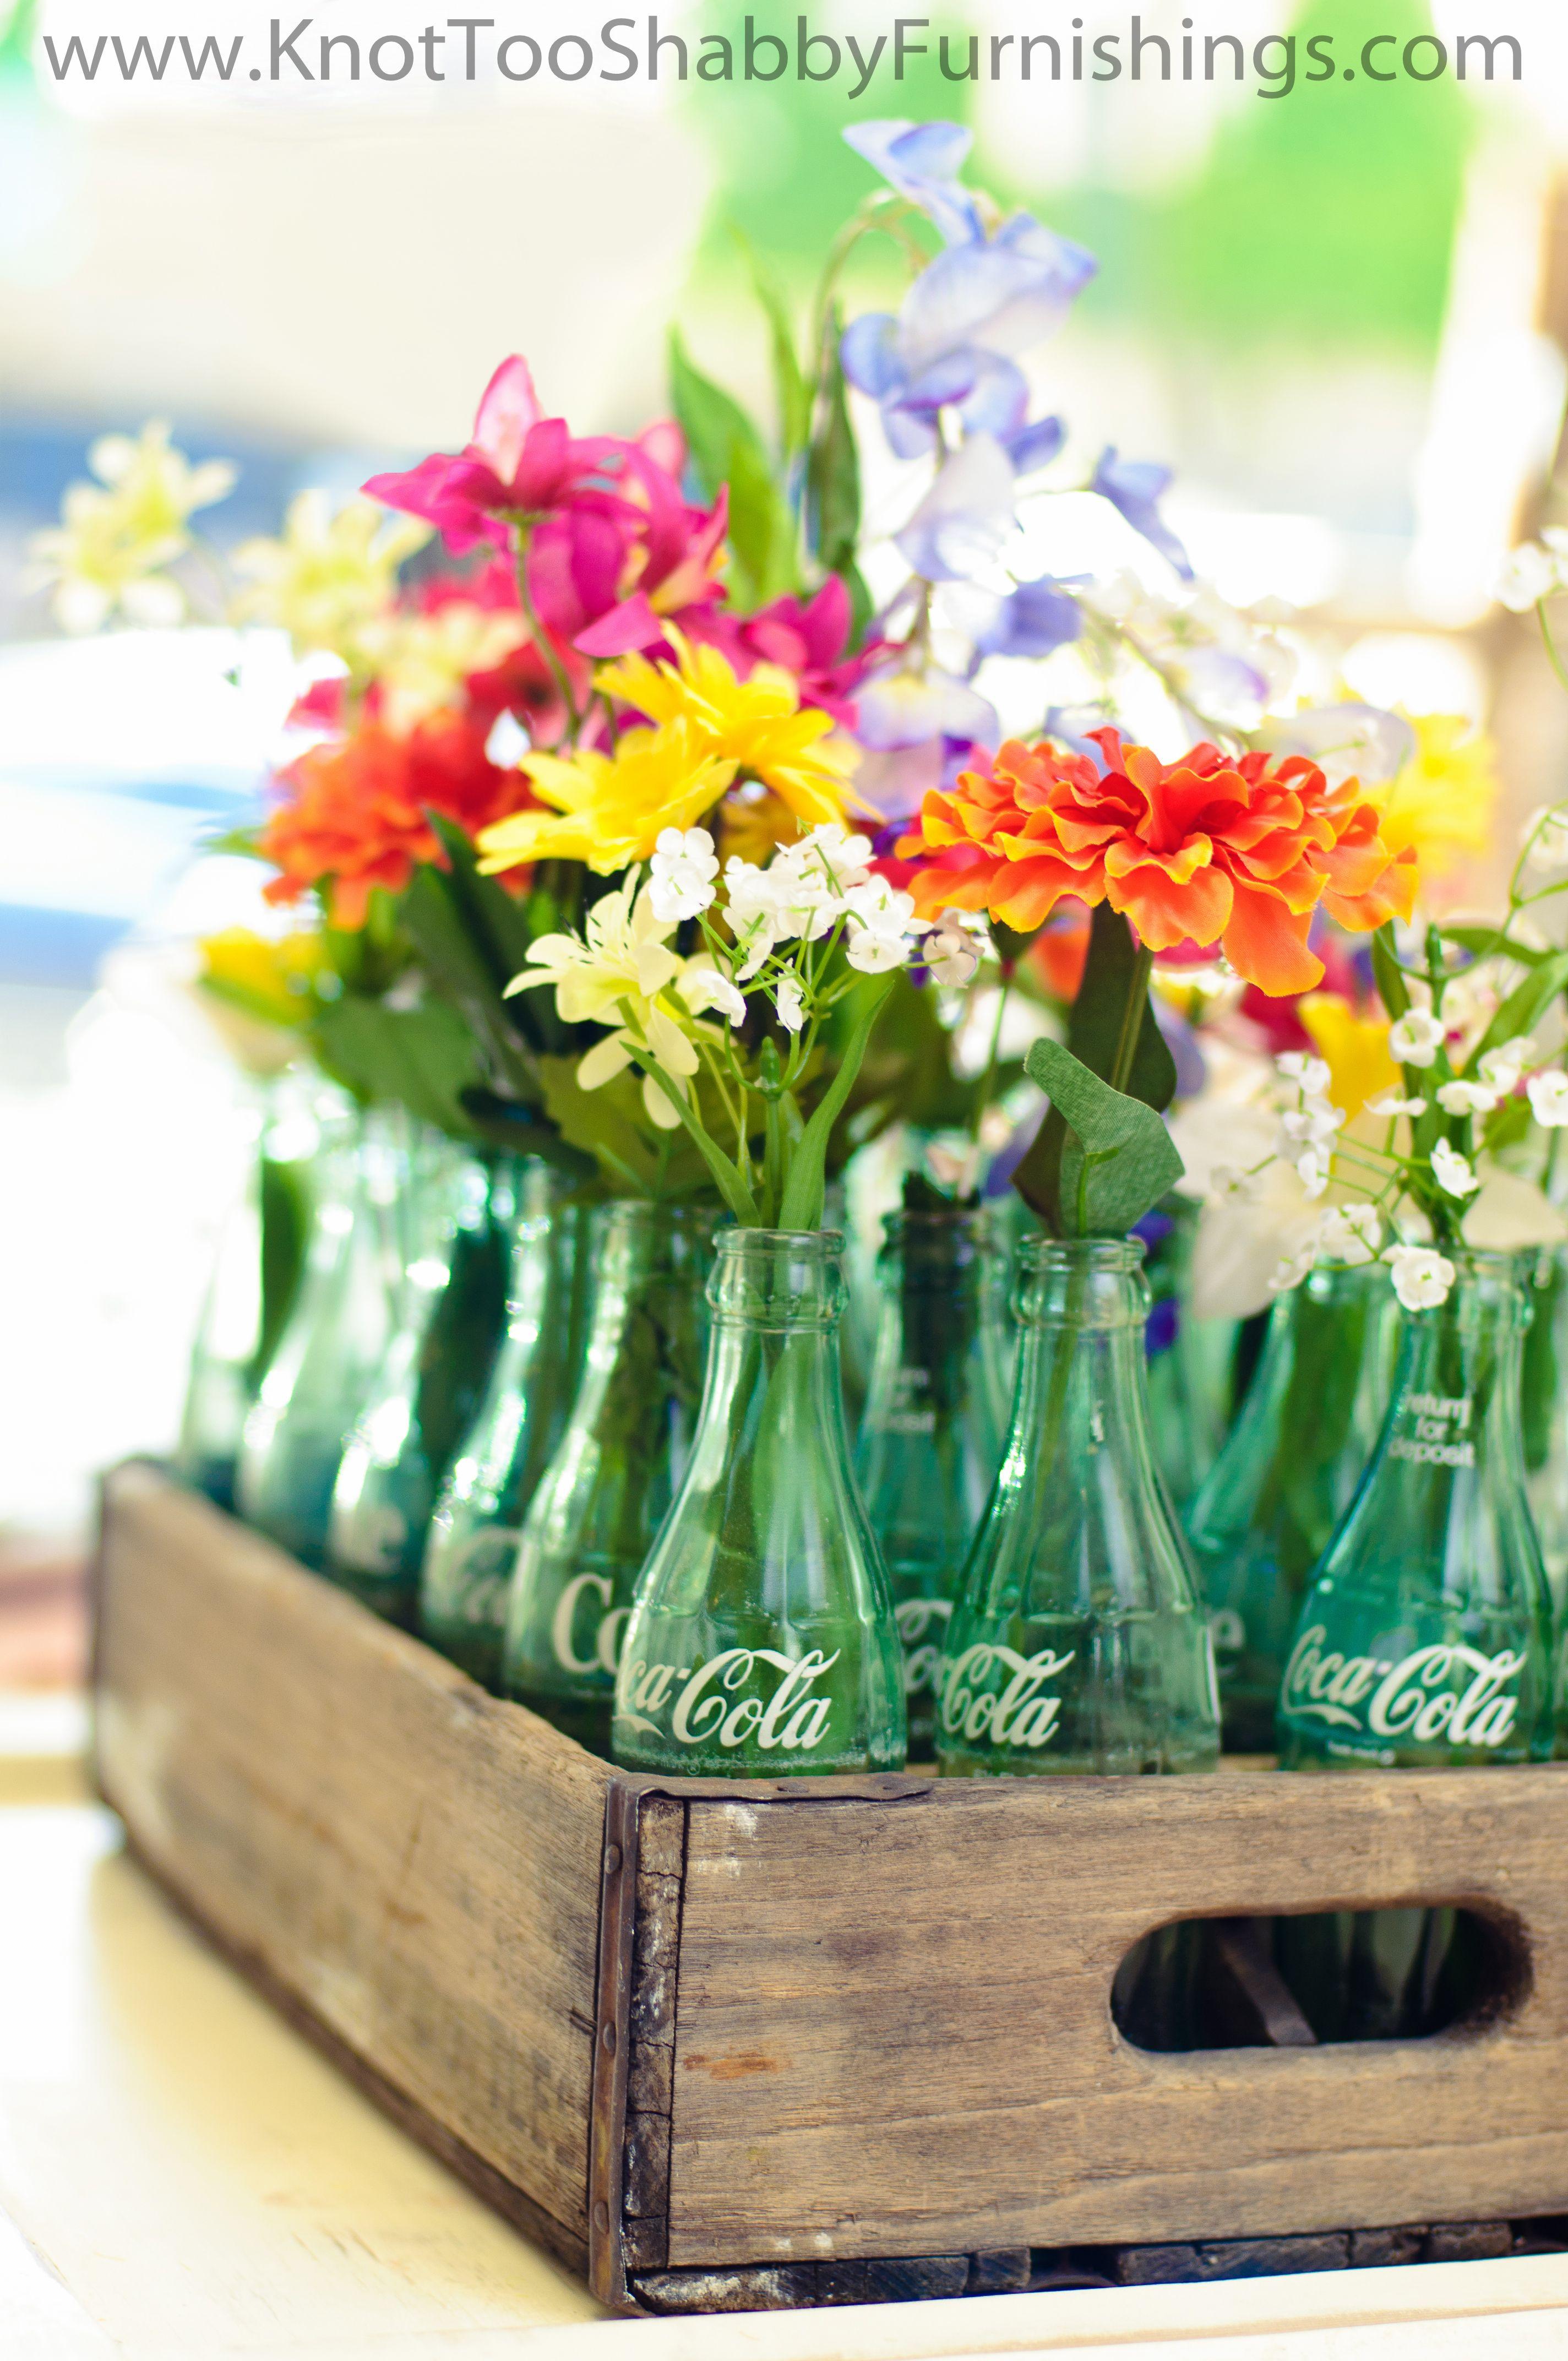 Floral arrangement with vintage Coca-Cola bottles in original wooden flat...Great centerpiece.